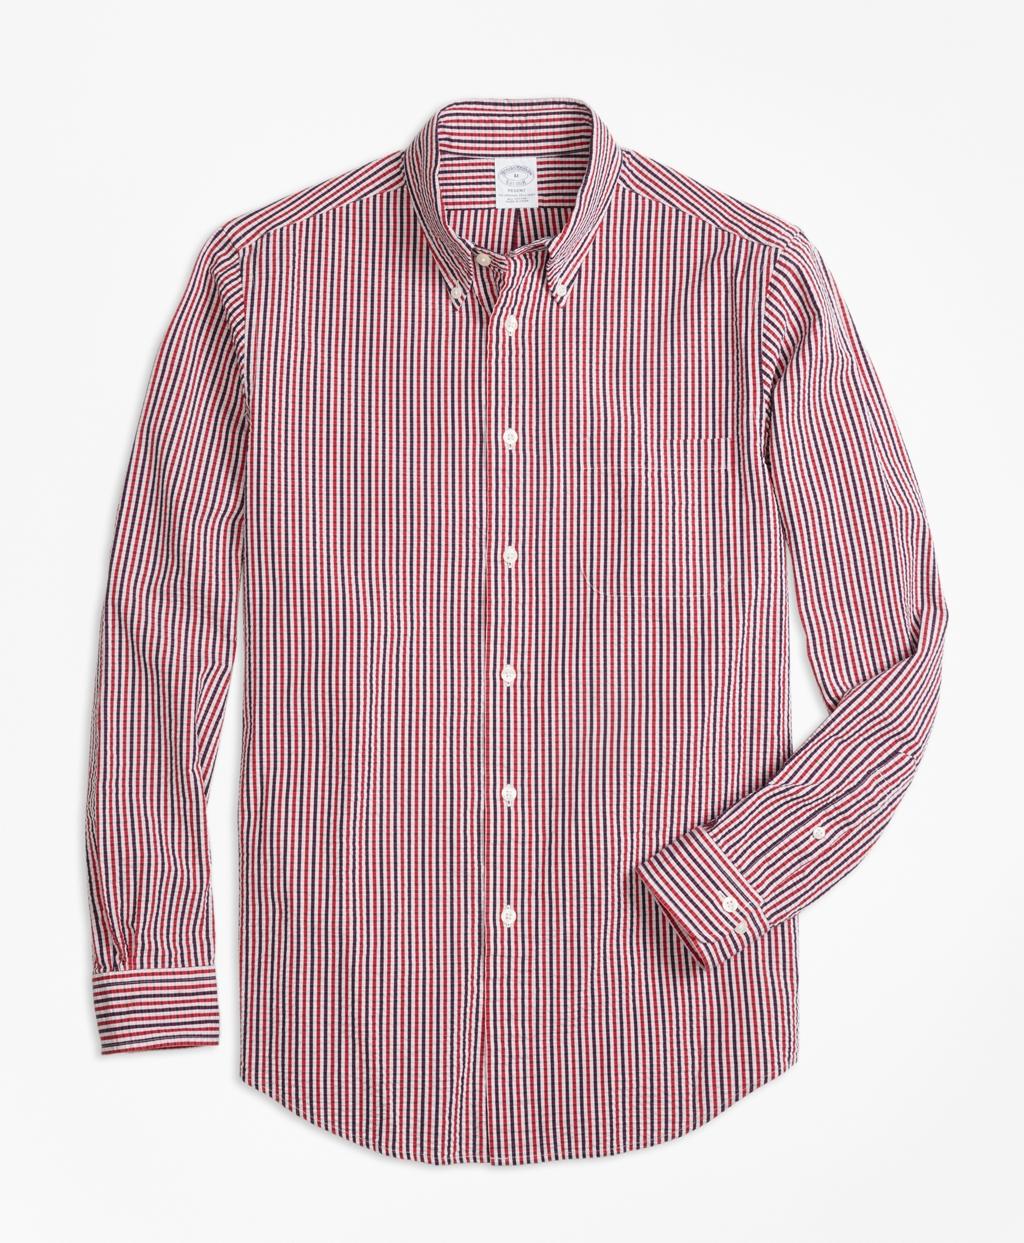 Brooksbrothers Regent Regular-Fit Sport Shirt, Check Seersucker